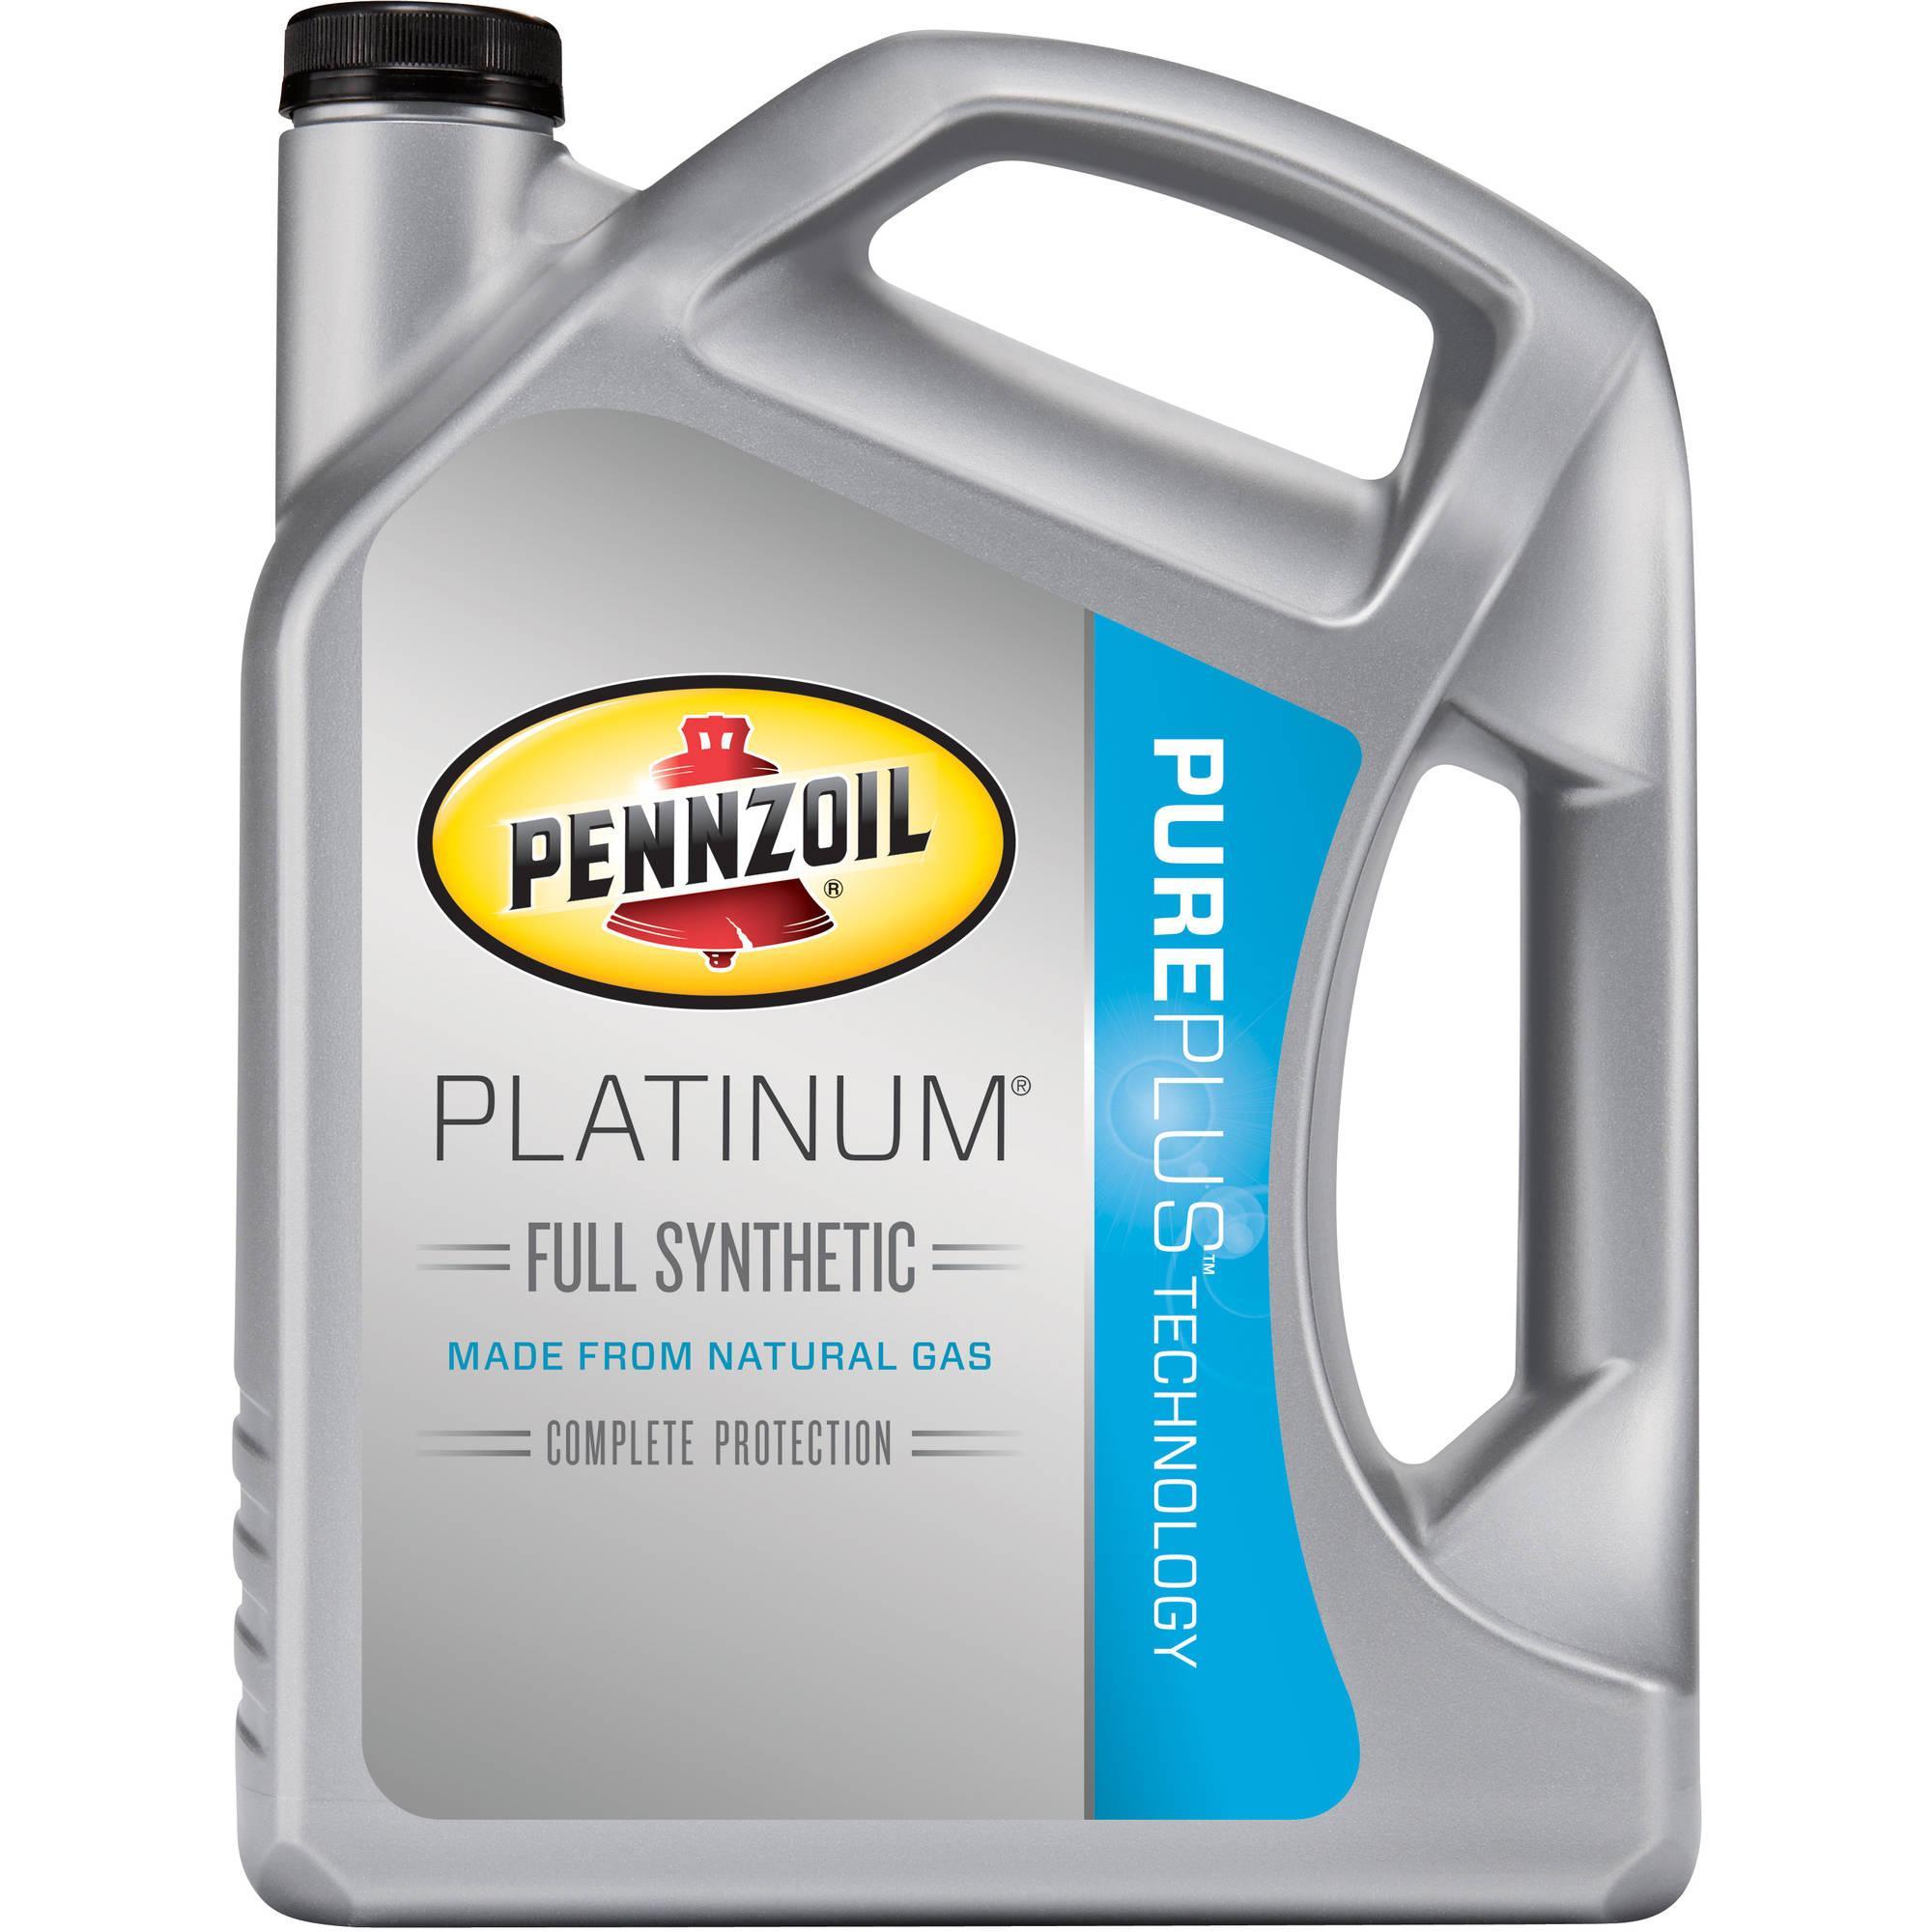 5 Quarts Pennzoil Platinum Full Synthetic Motor Oil (Various Grades) $7.47+tax after Rebates @ Walmart